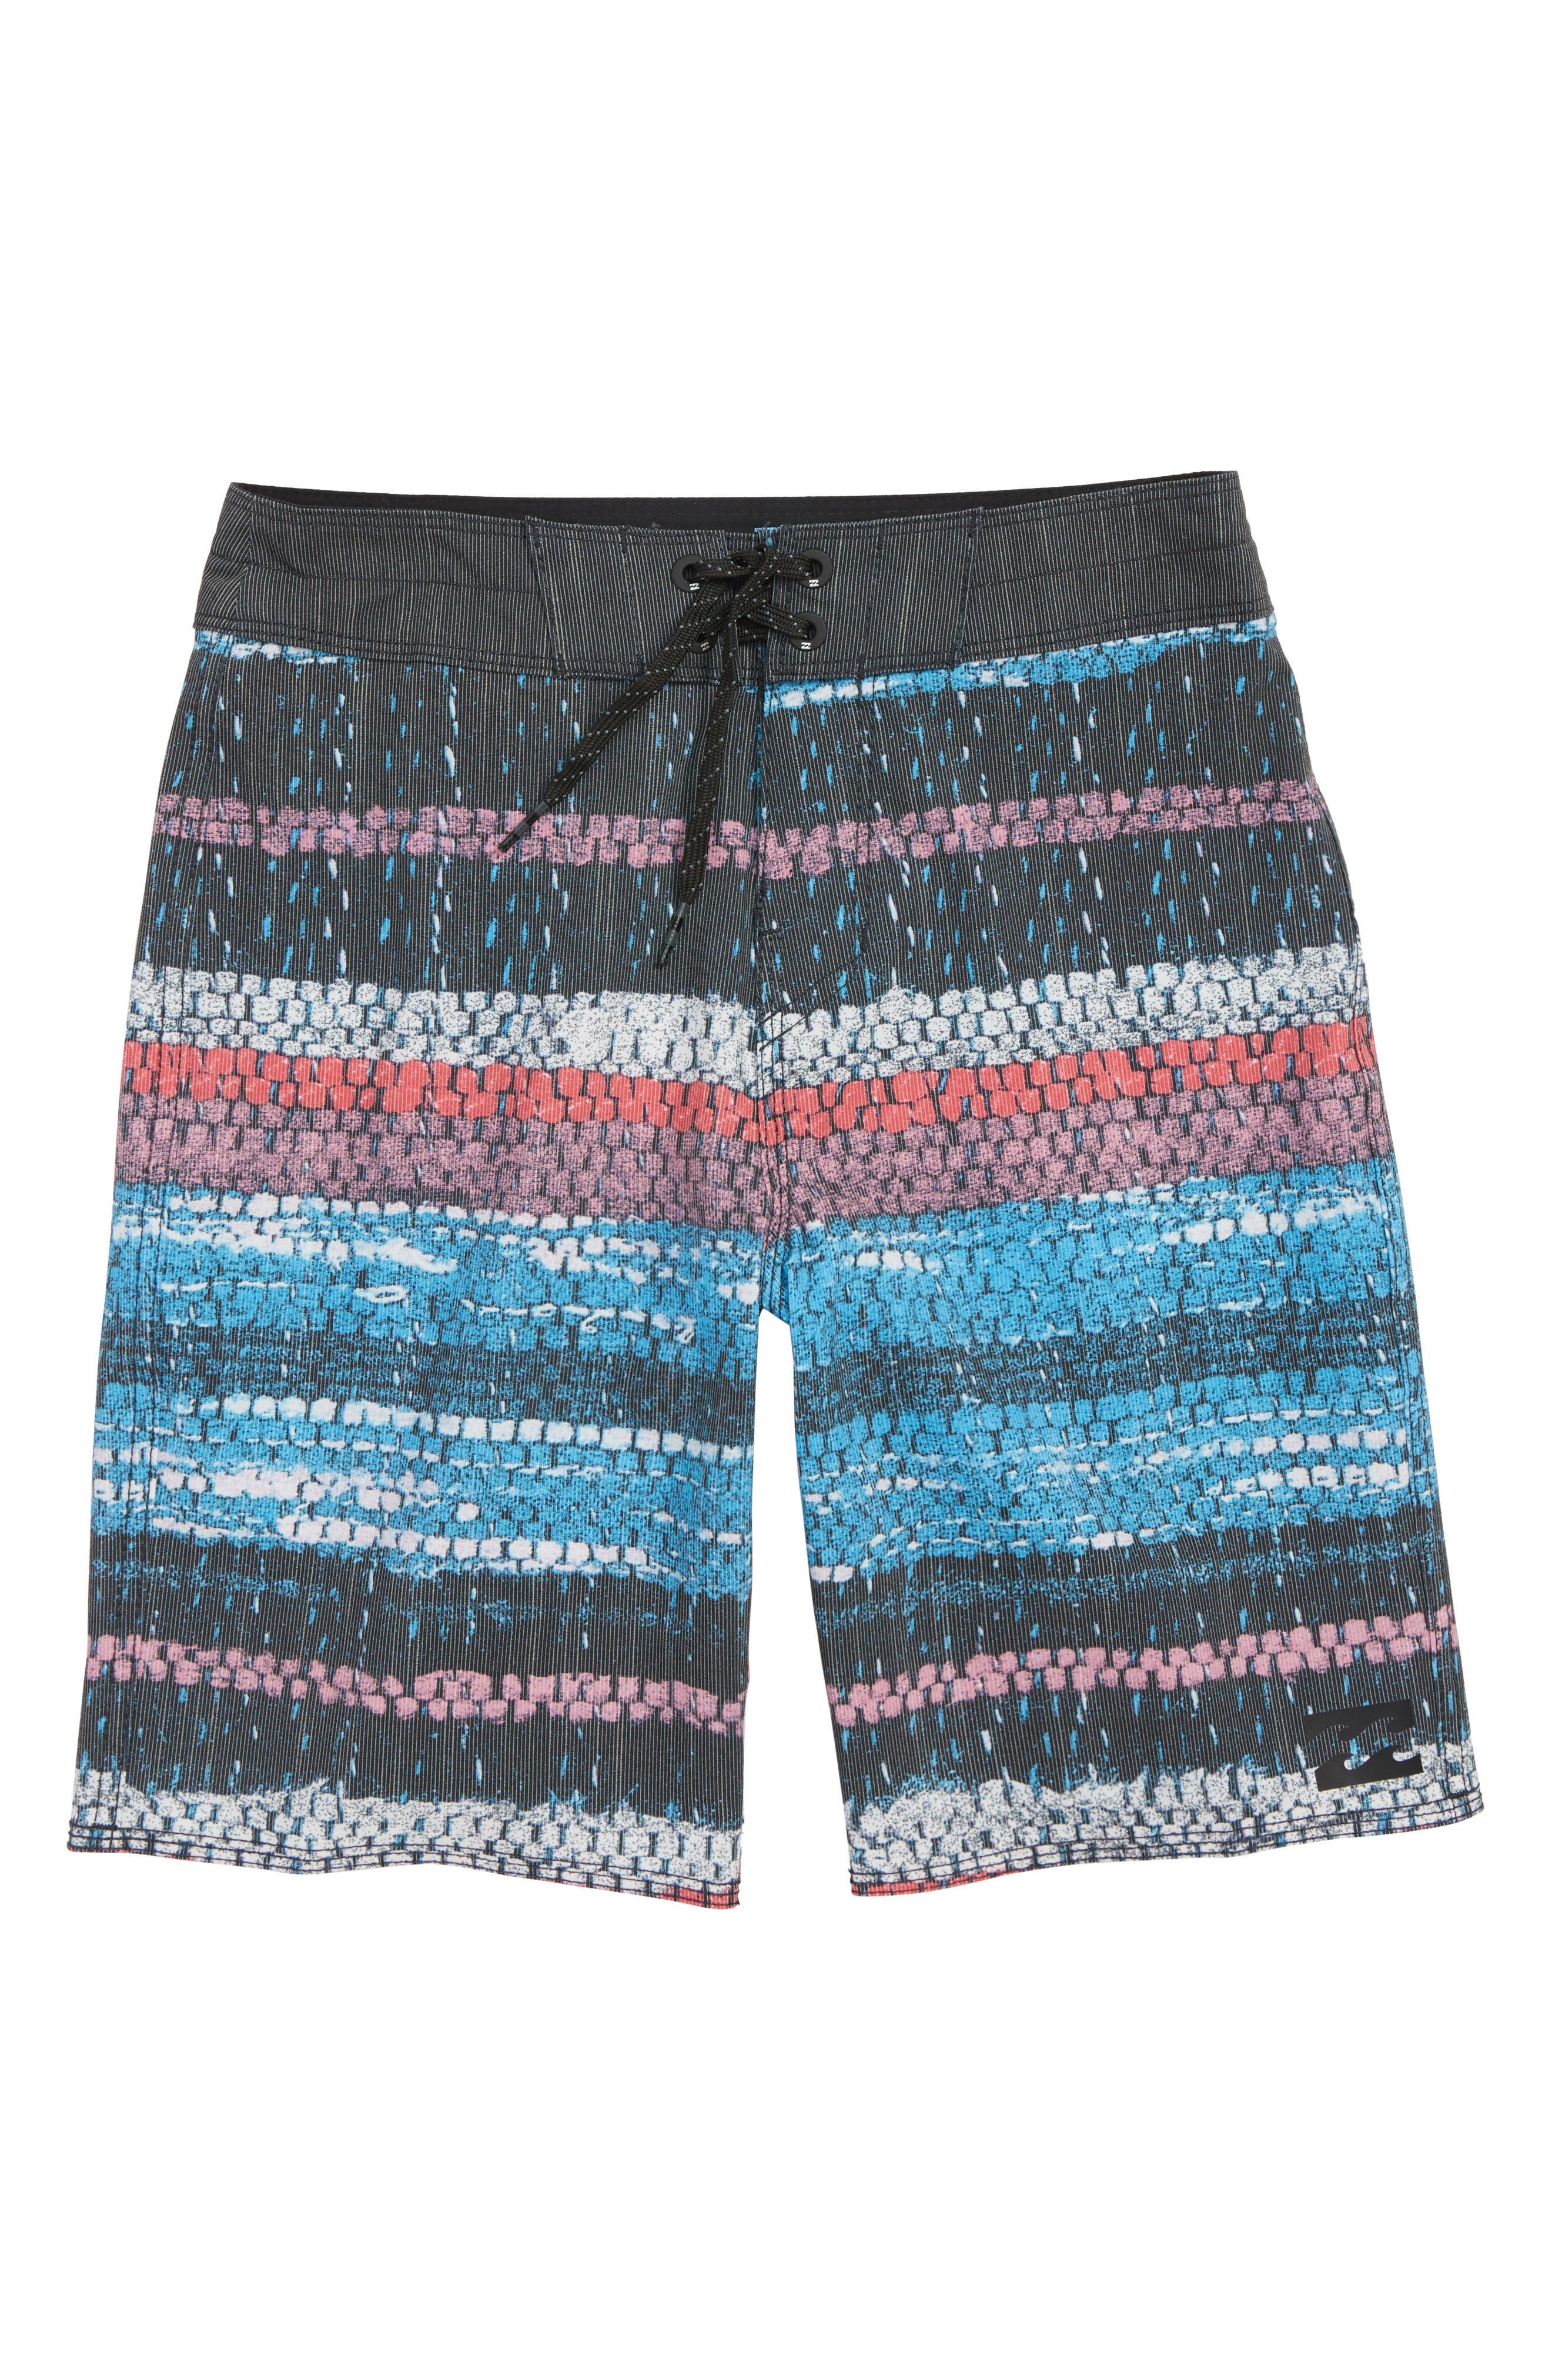 Sundays X Board Shorts,                             Main thumbnail 1, color,                             BLUE STRIPE